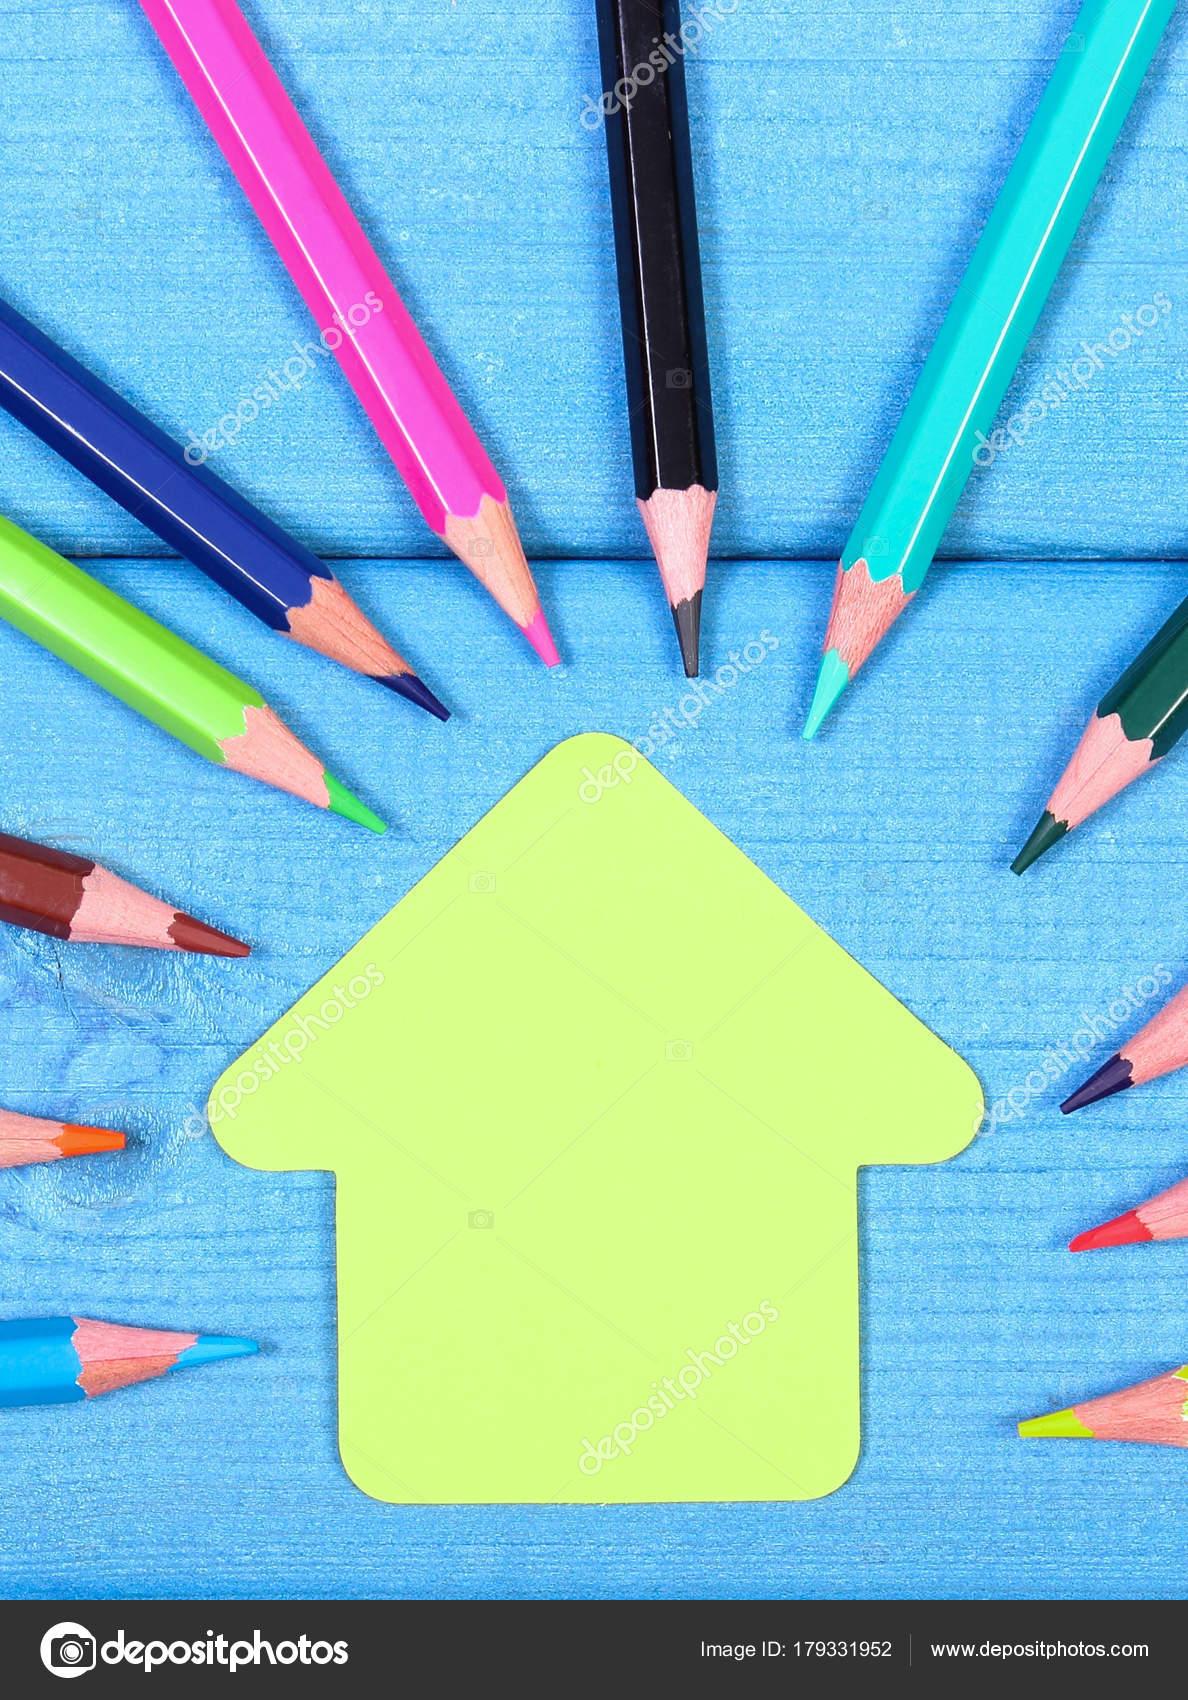 40fdc28805 Πολύχρωμα μολύβια και το σχήμα του σχολικό κτίριο σε μπλε πίνακες ...